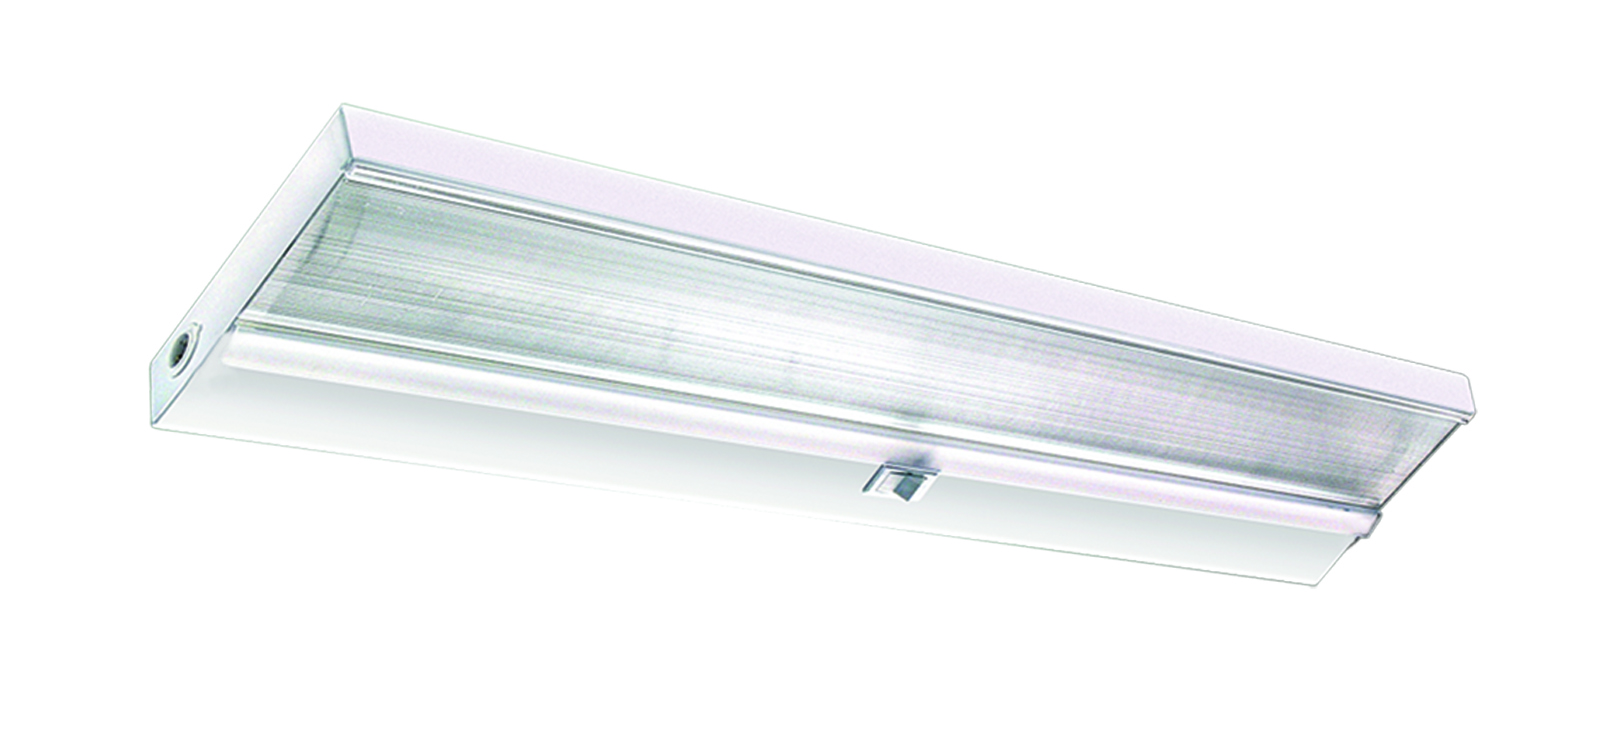 Spectra-SF LED